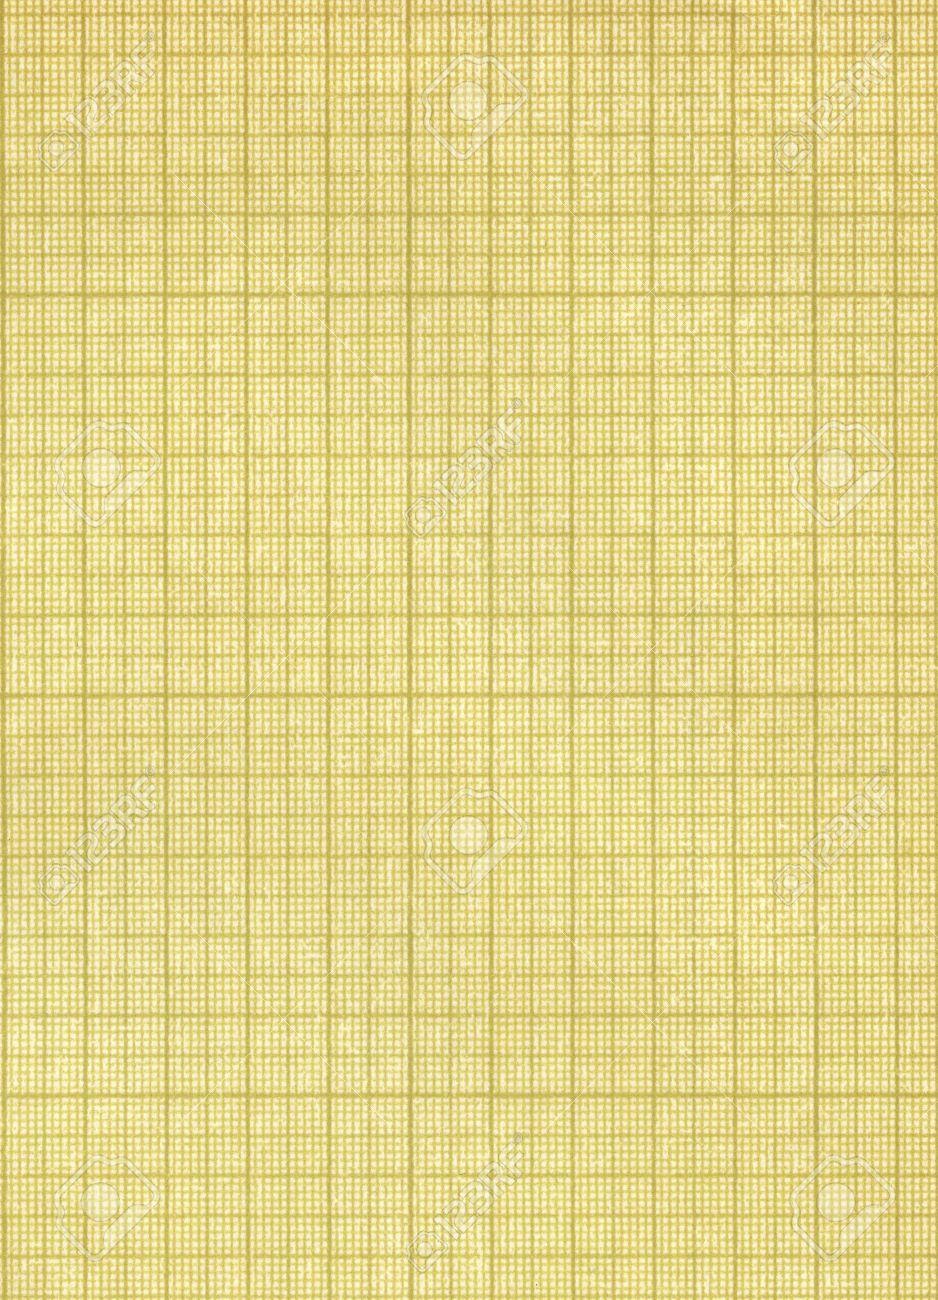 xxl millimeter paper graph paper plotting paper stock photo